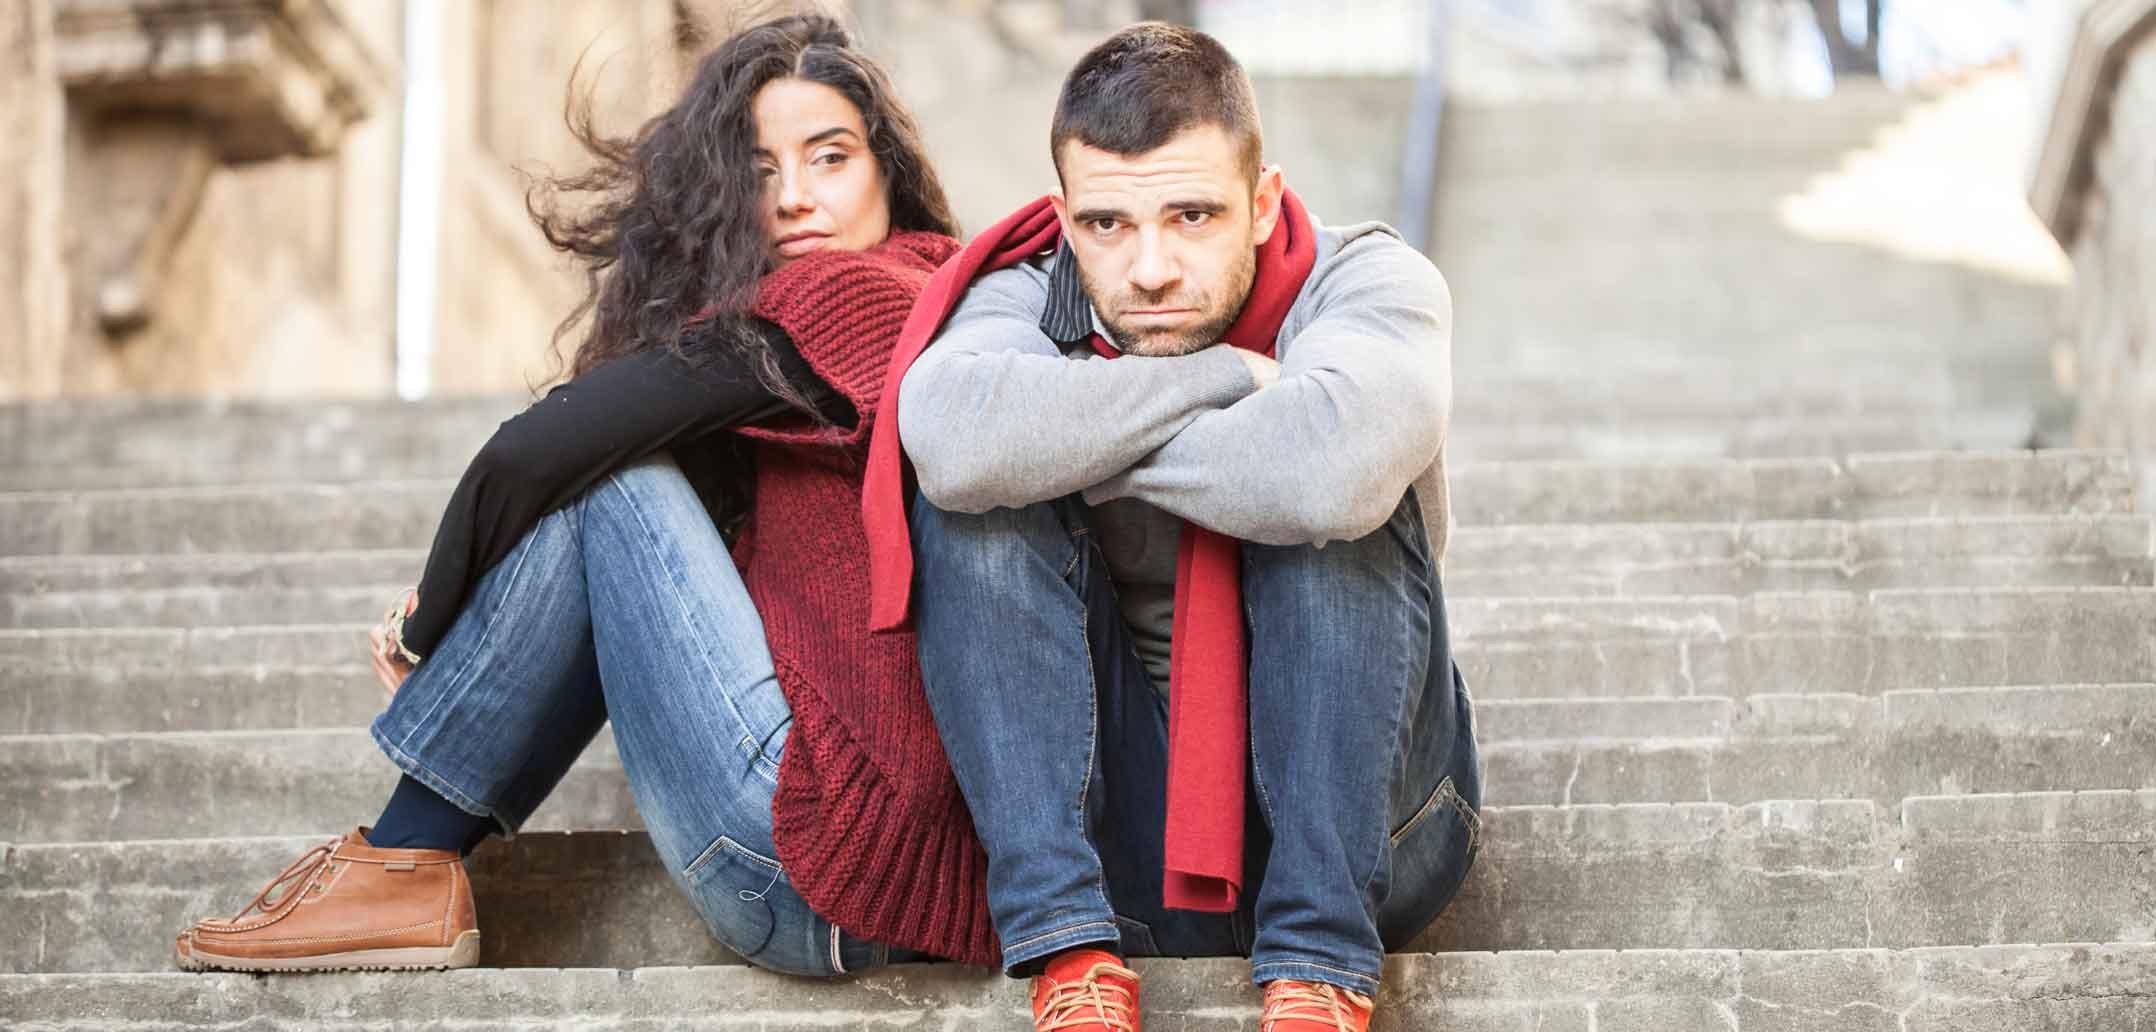 Kostenlose Dating-Anrufe